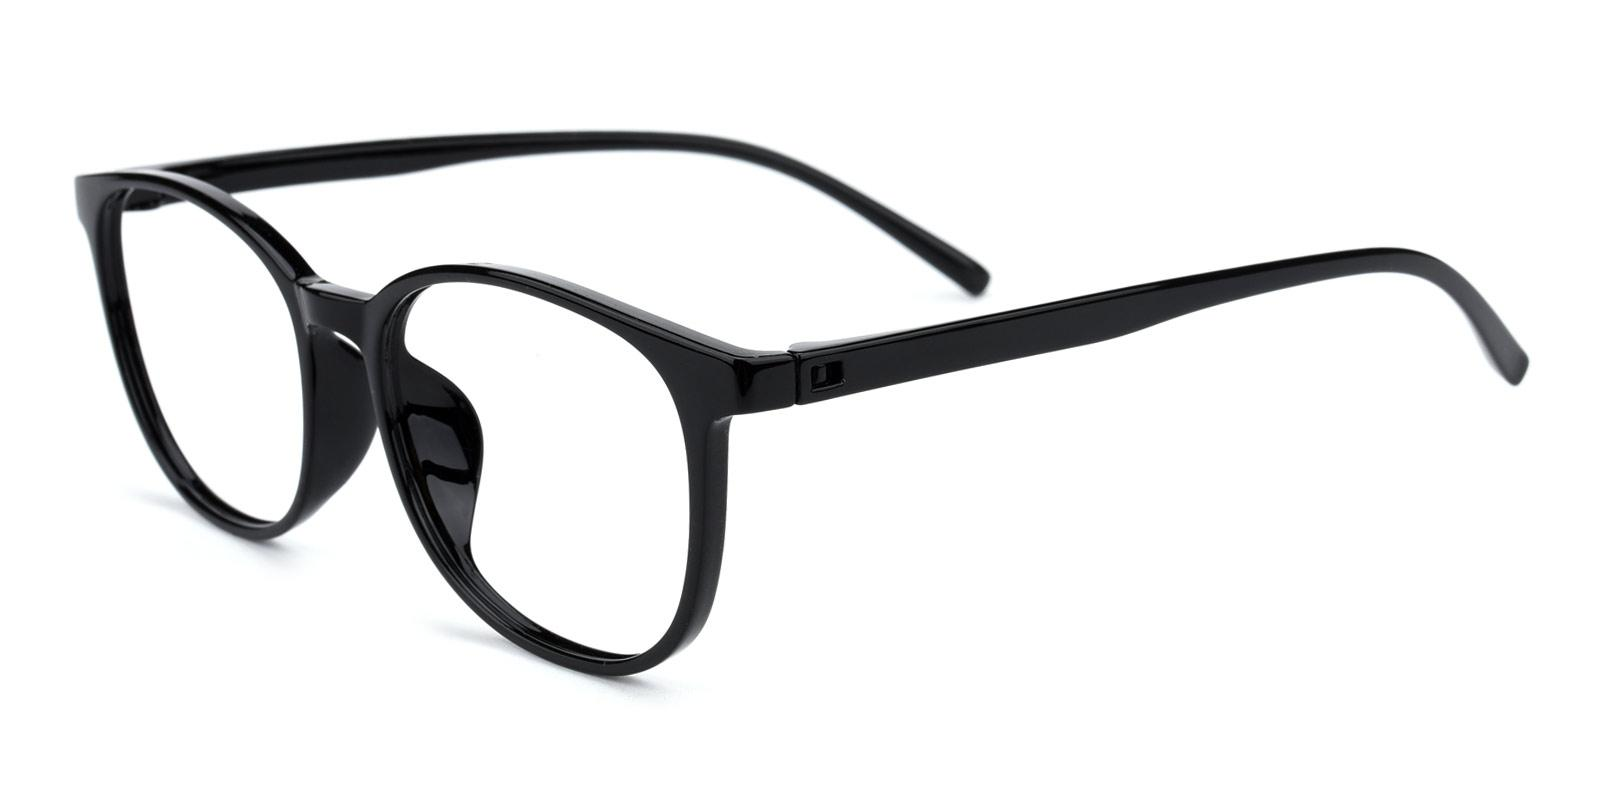 Geoff-Black-Rectangle / Round-TR-Eyeglasses-detail